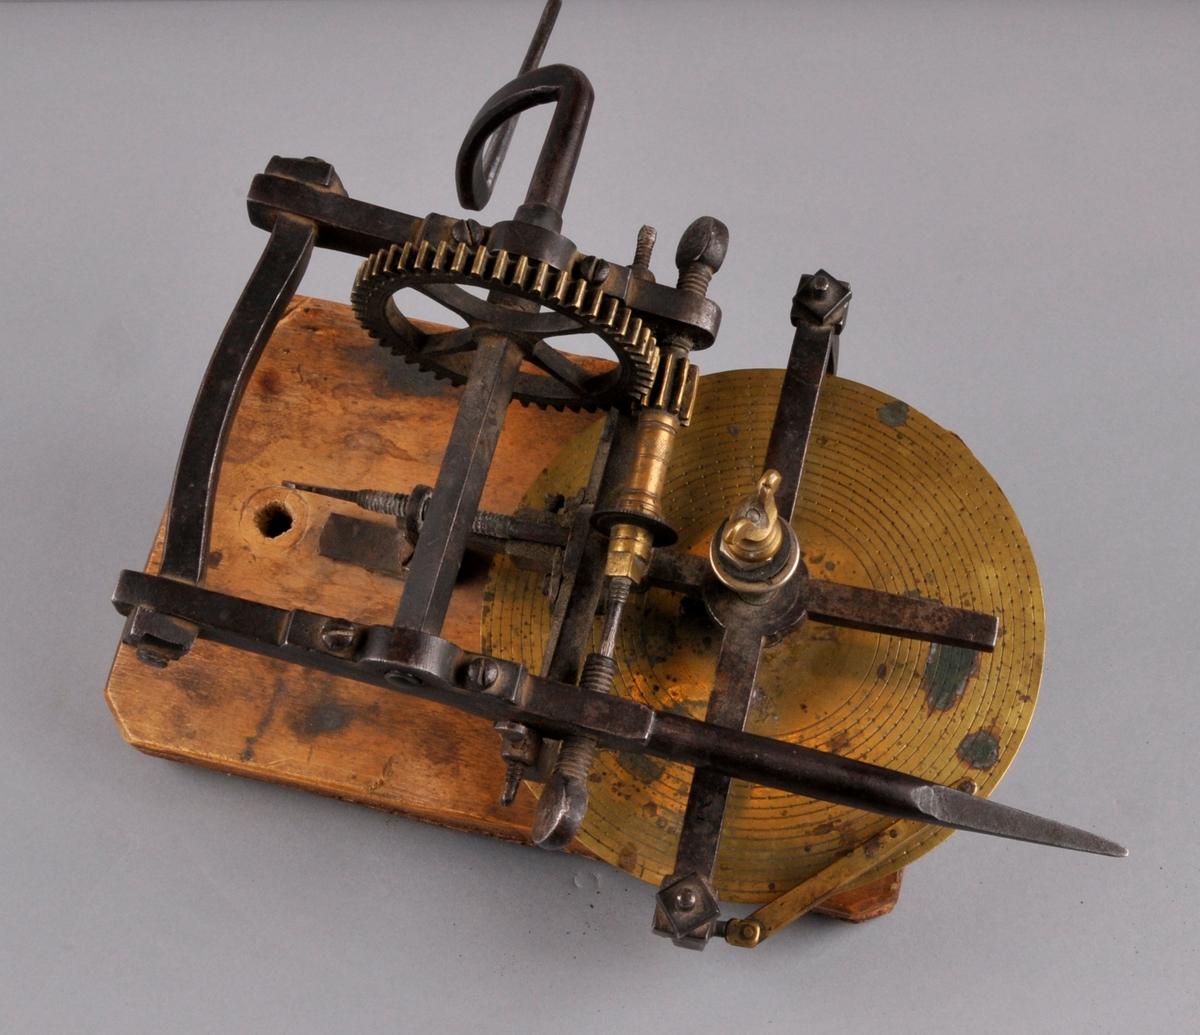 Urmakerverktøy.